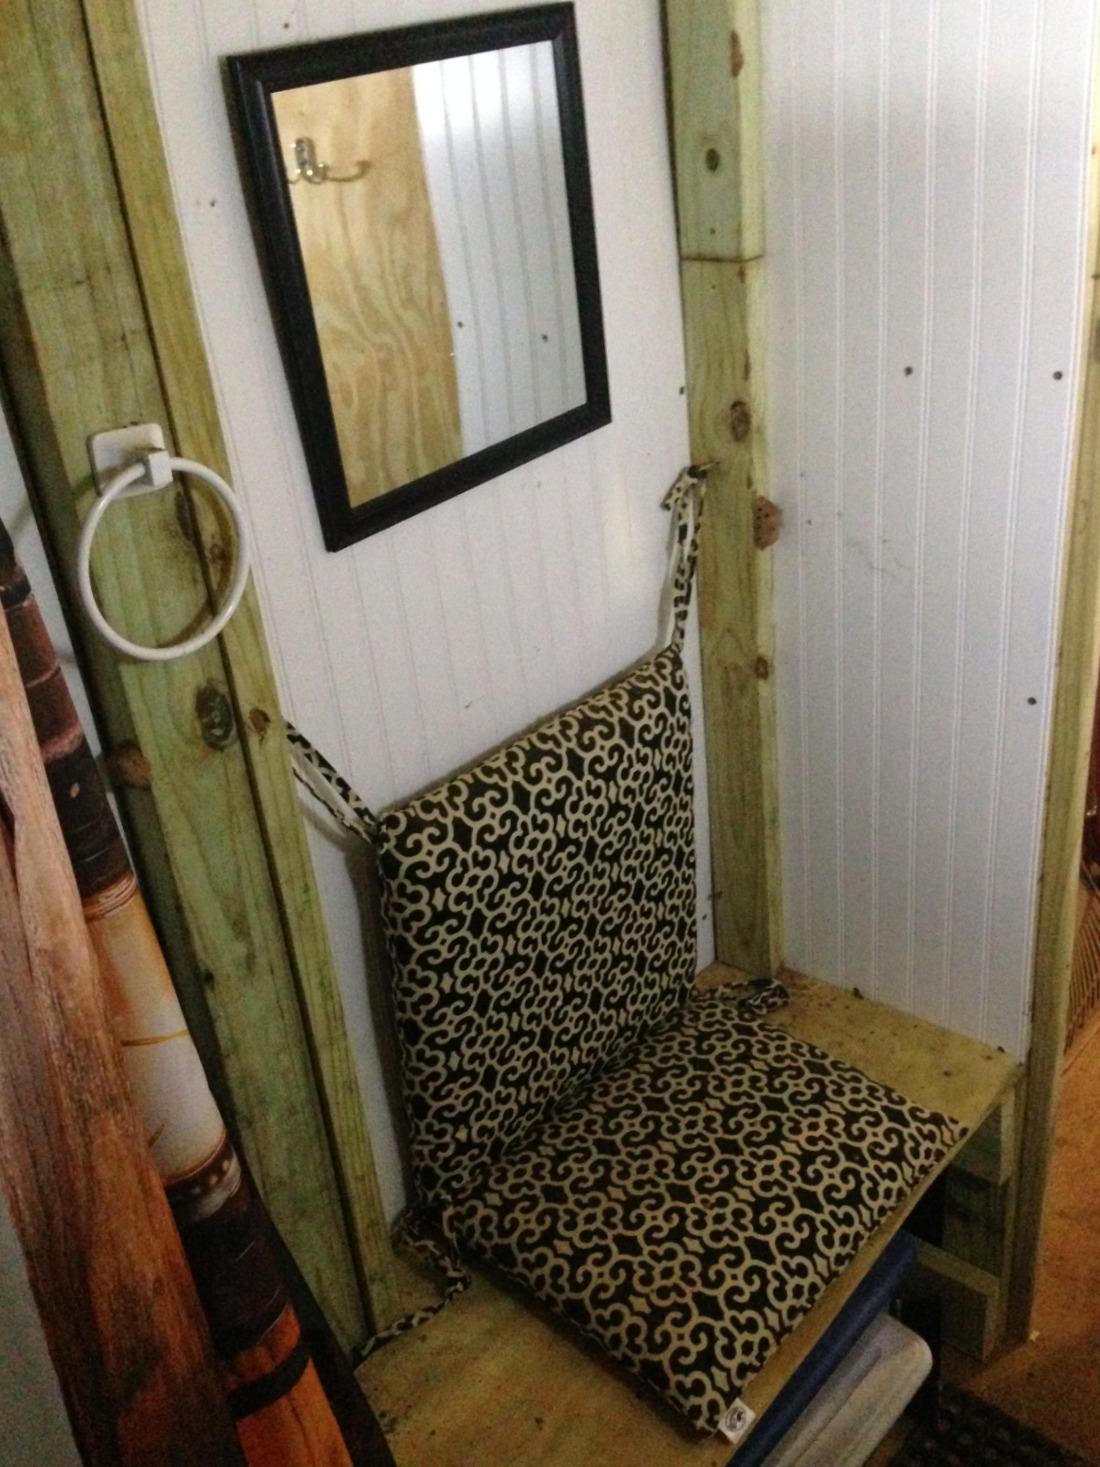 Seating Area inside Shower Room